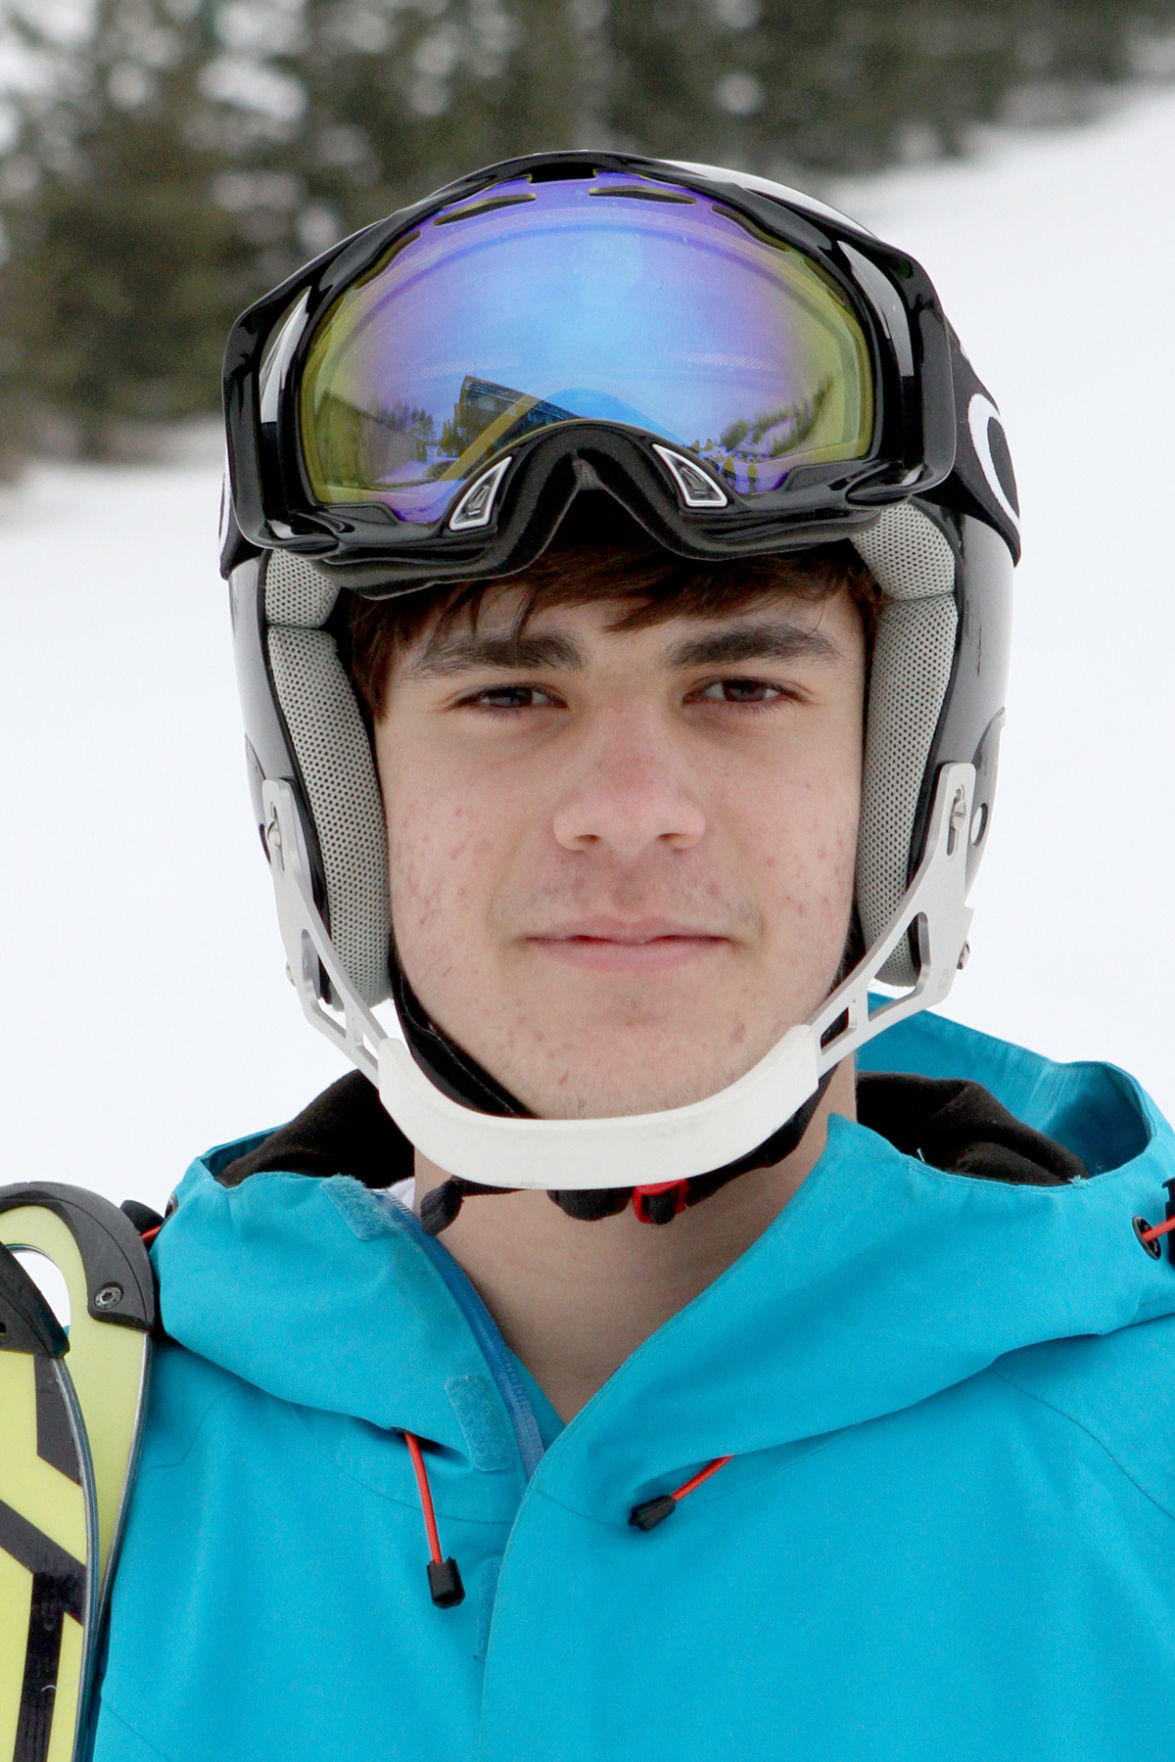 West skier Schwickert is planning one last hurrah | Sports ...